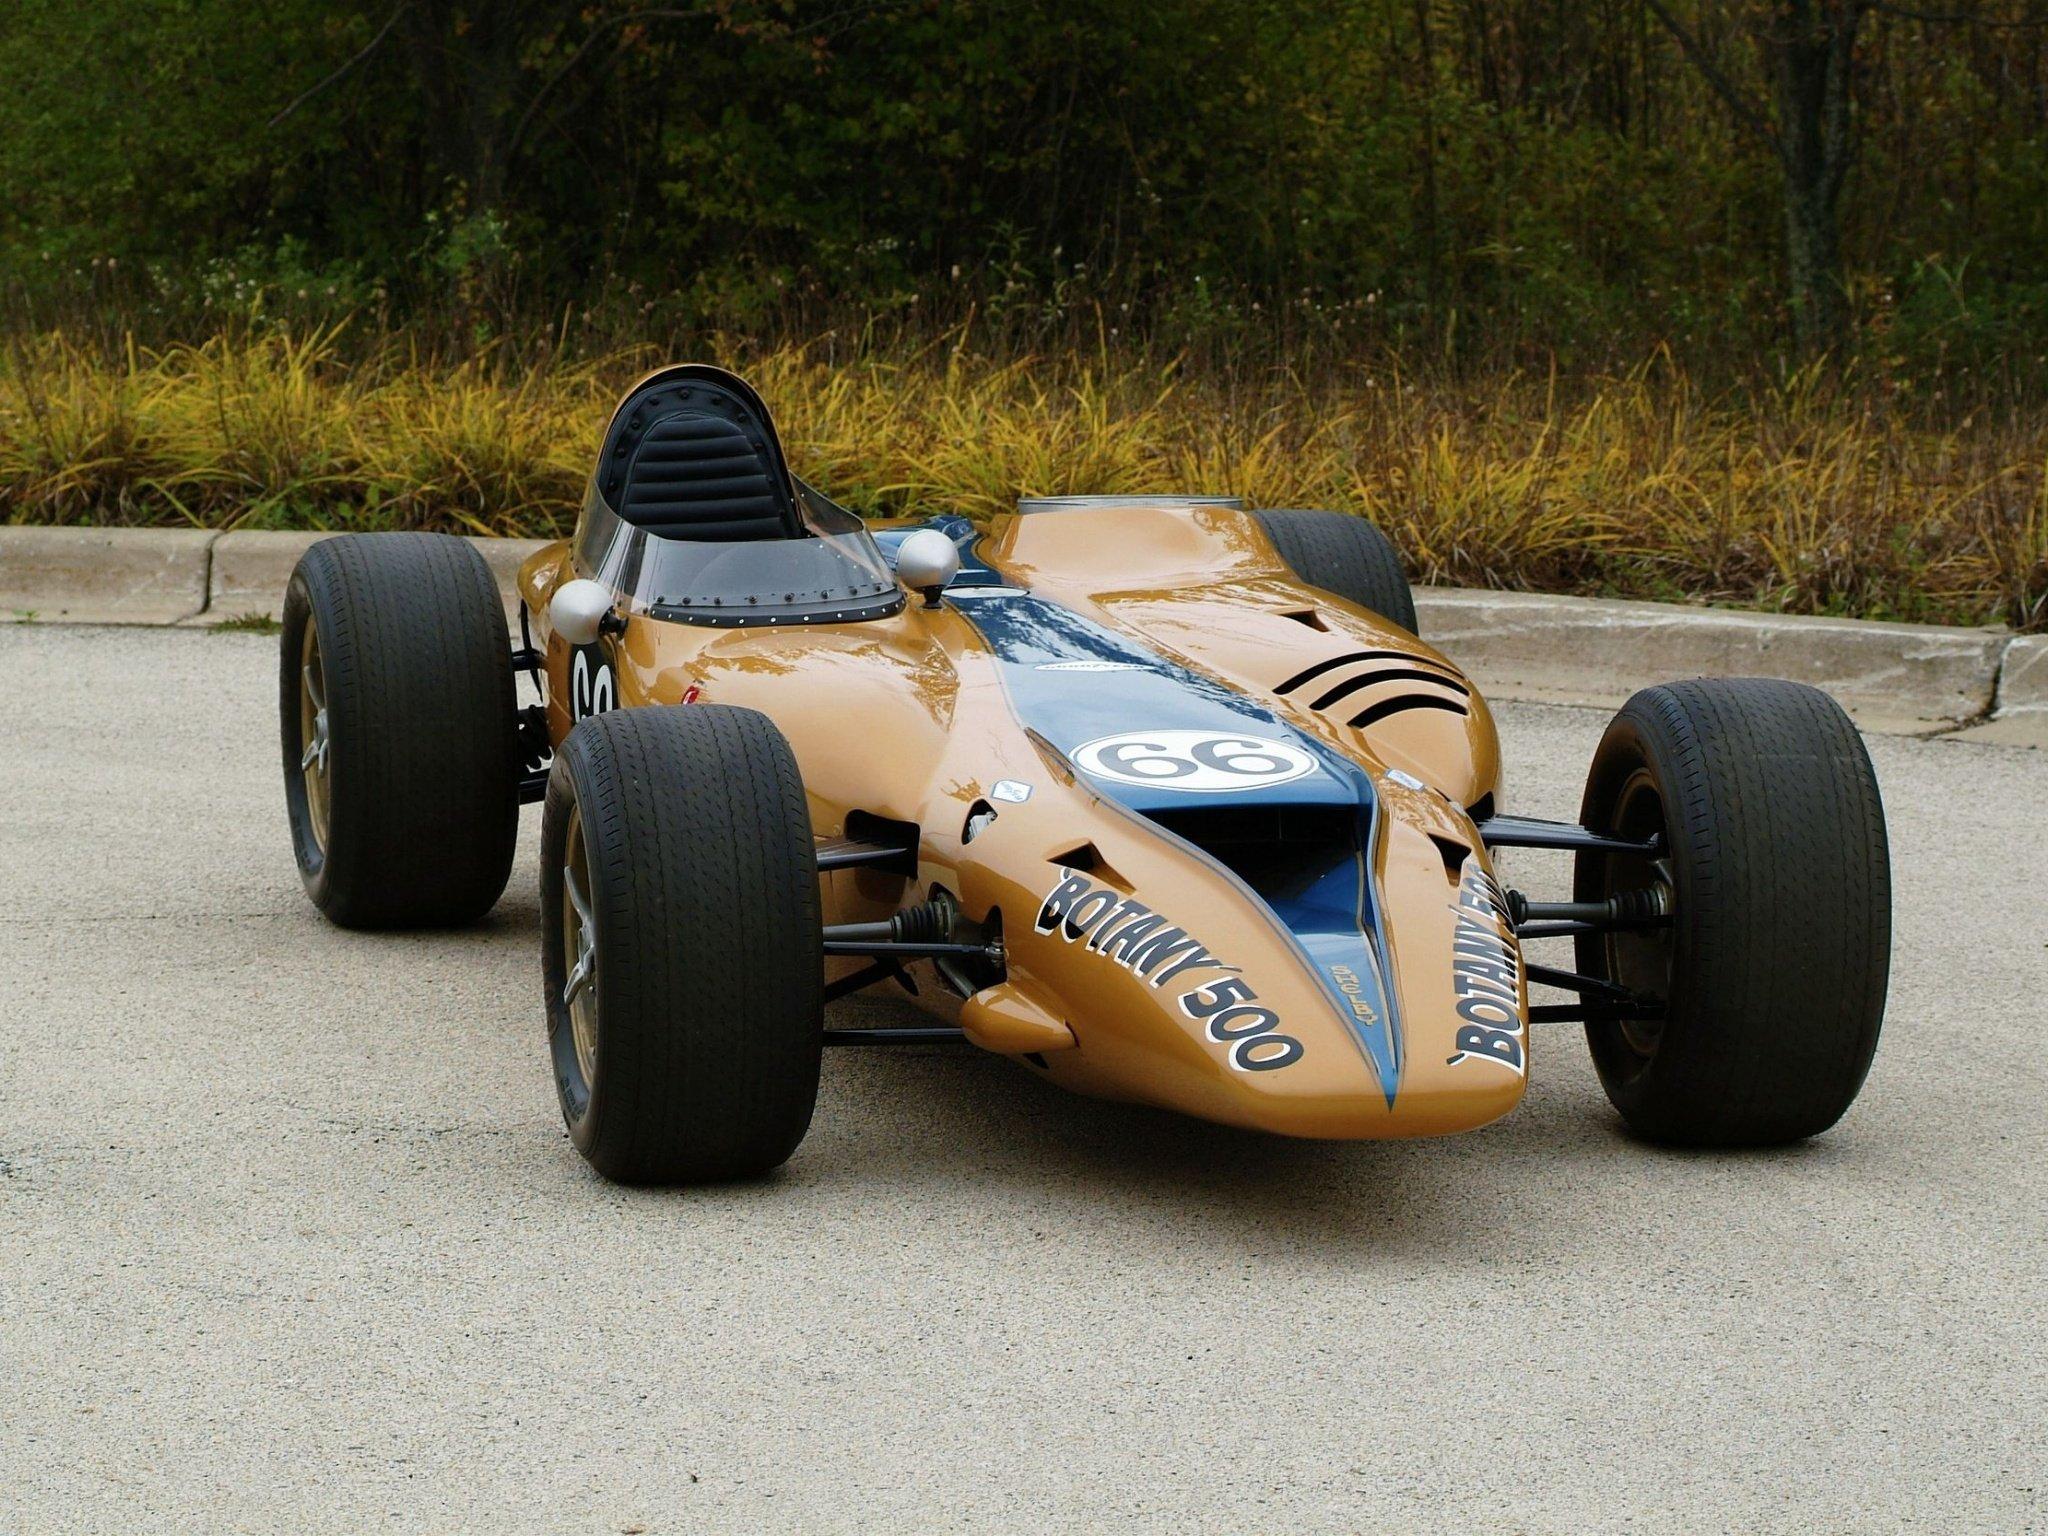 1968 Shelby Turbine Indy Car wallpaper